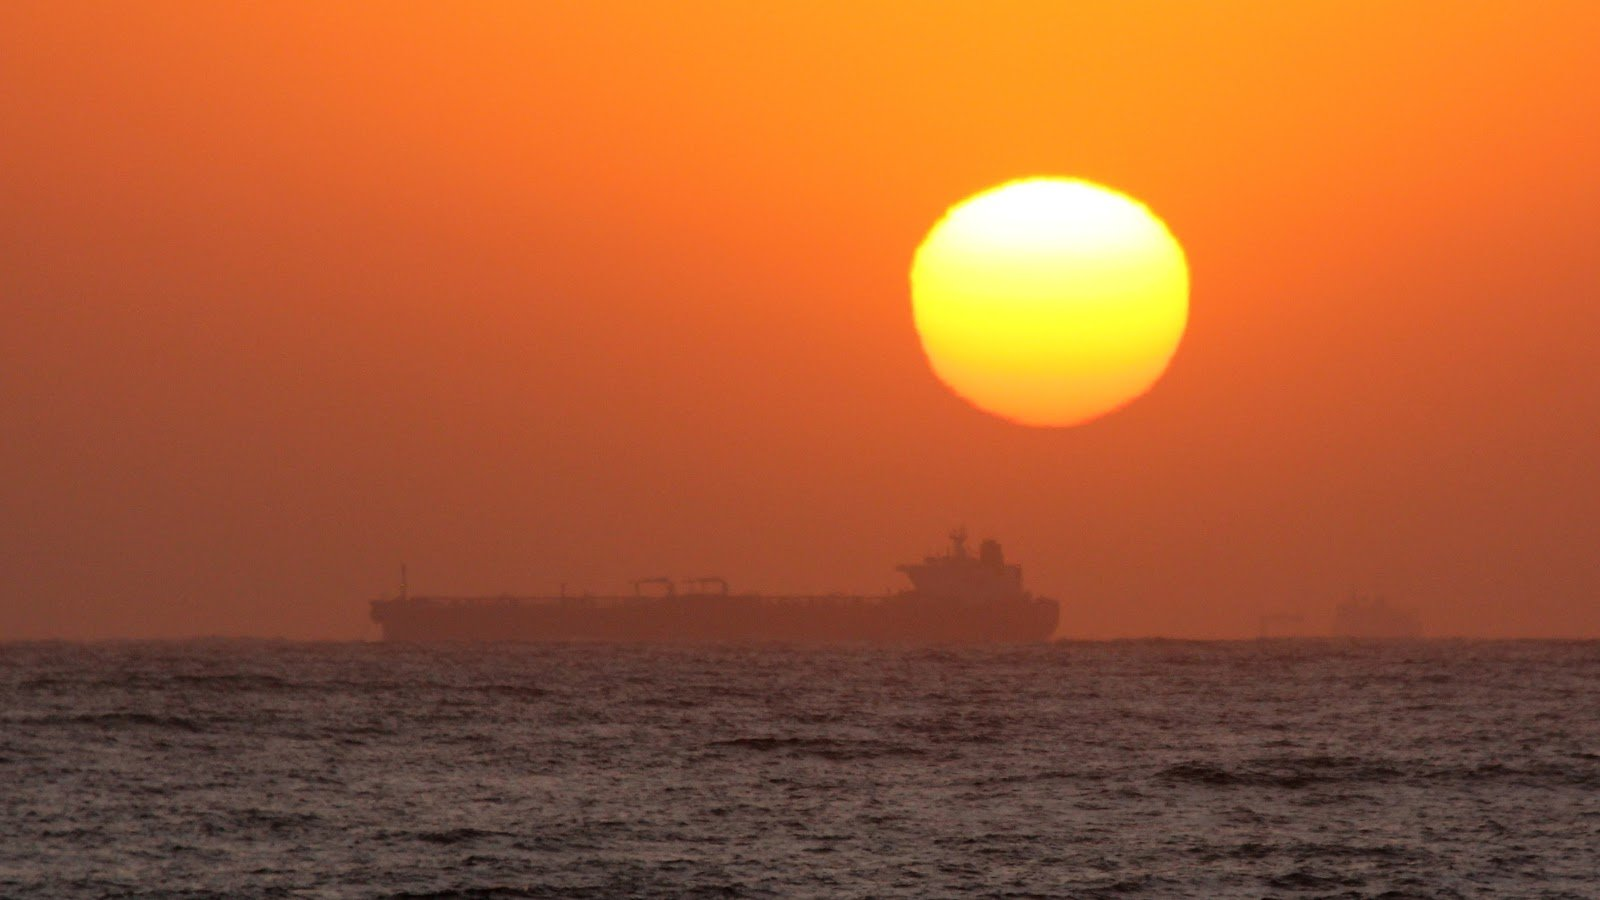 Sunrise over the Indian ocean at Umdlotu